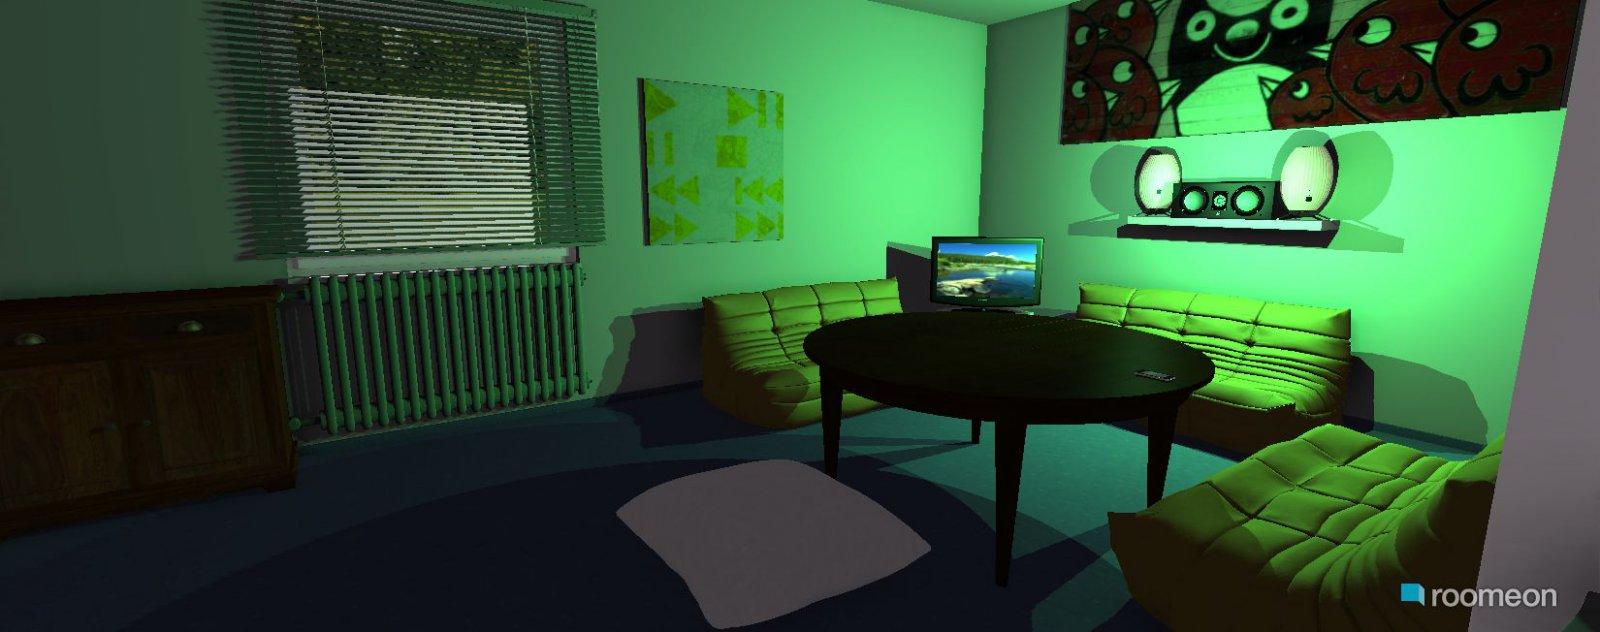 Room Design Gaming Zimmer Roomeon Community